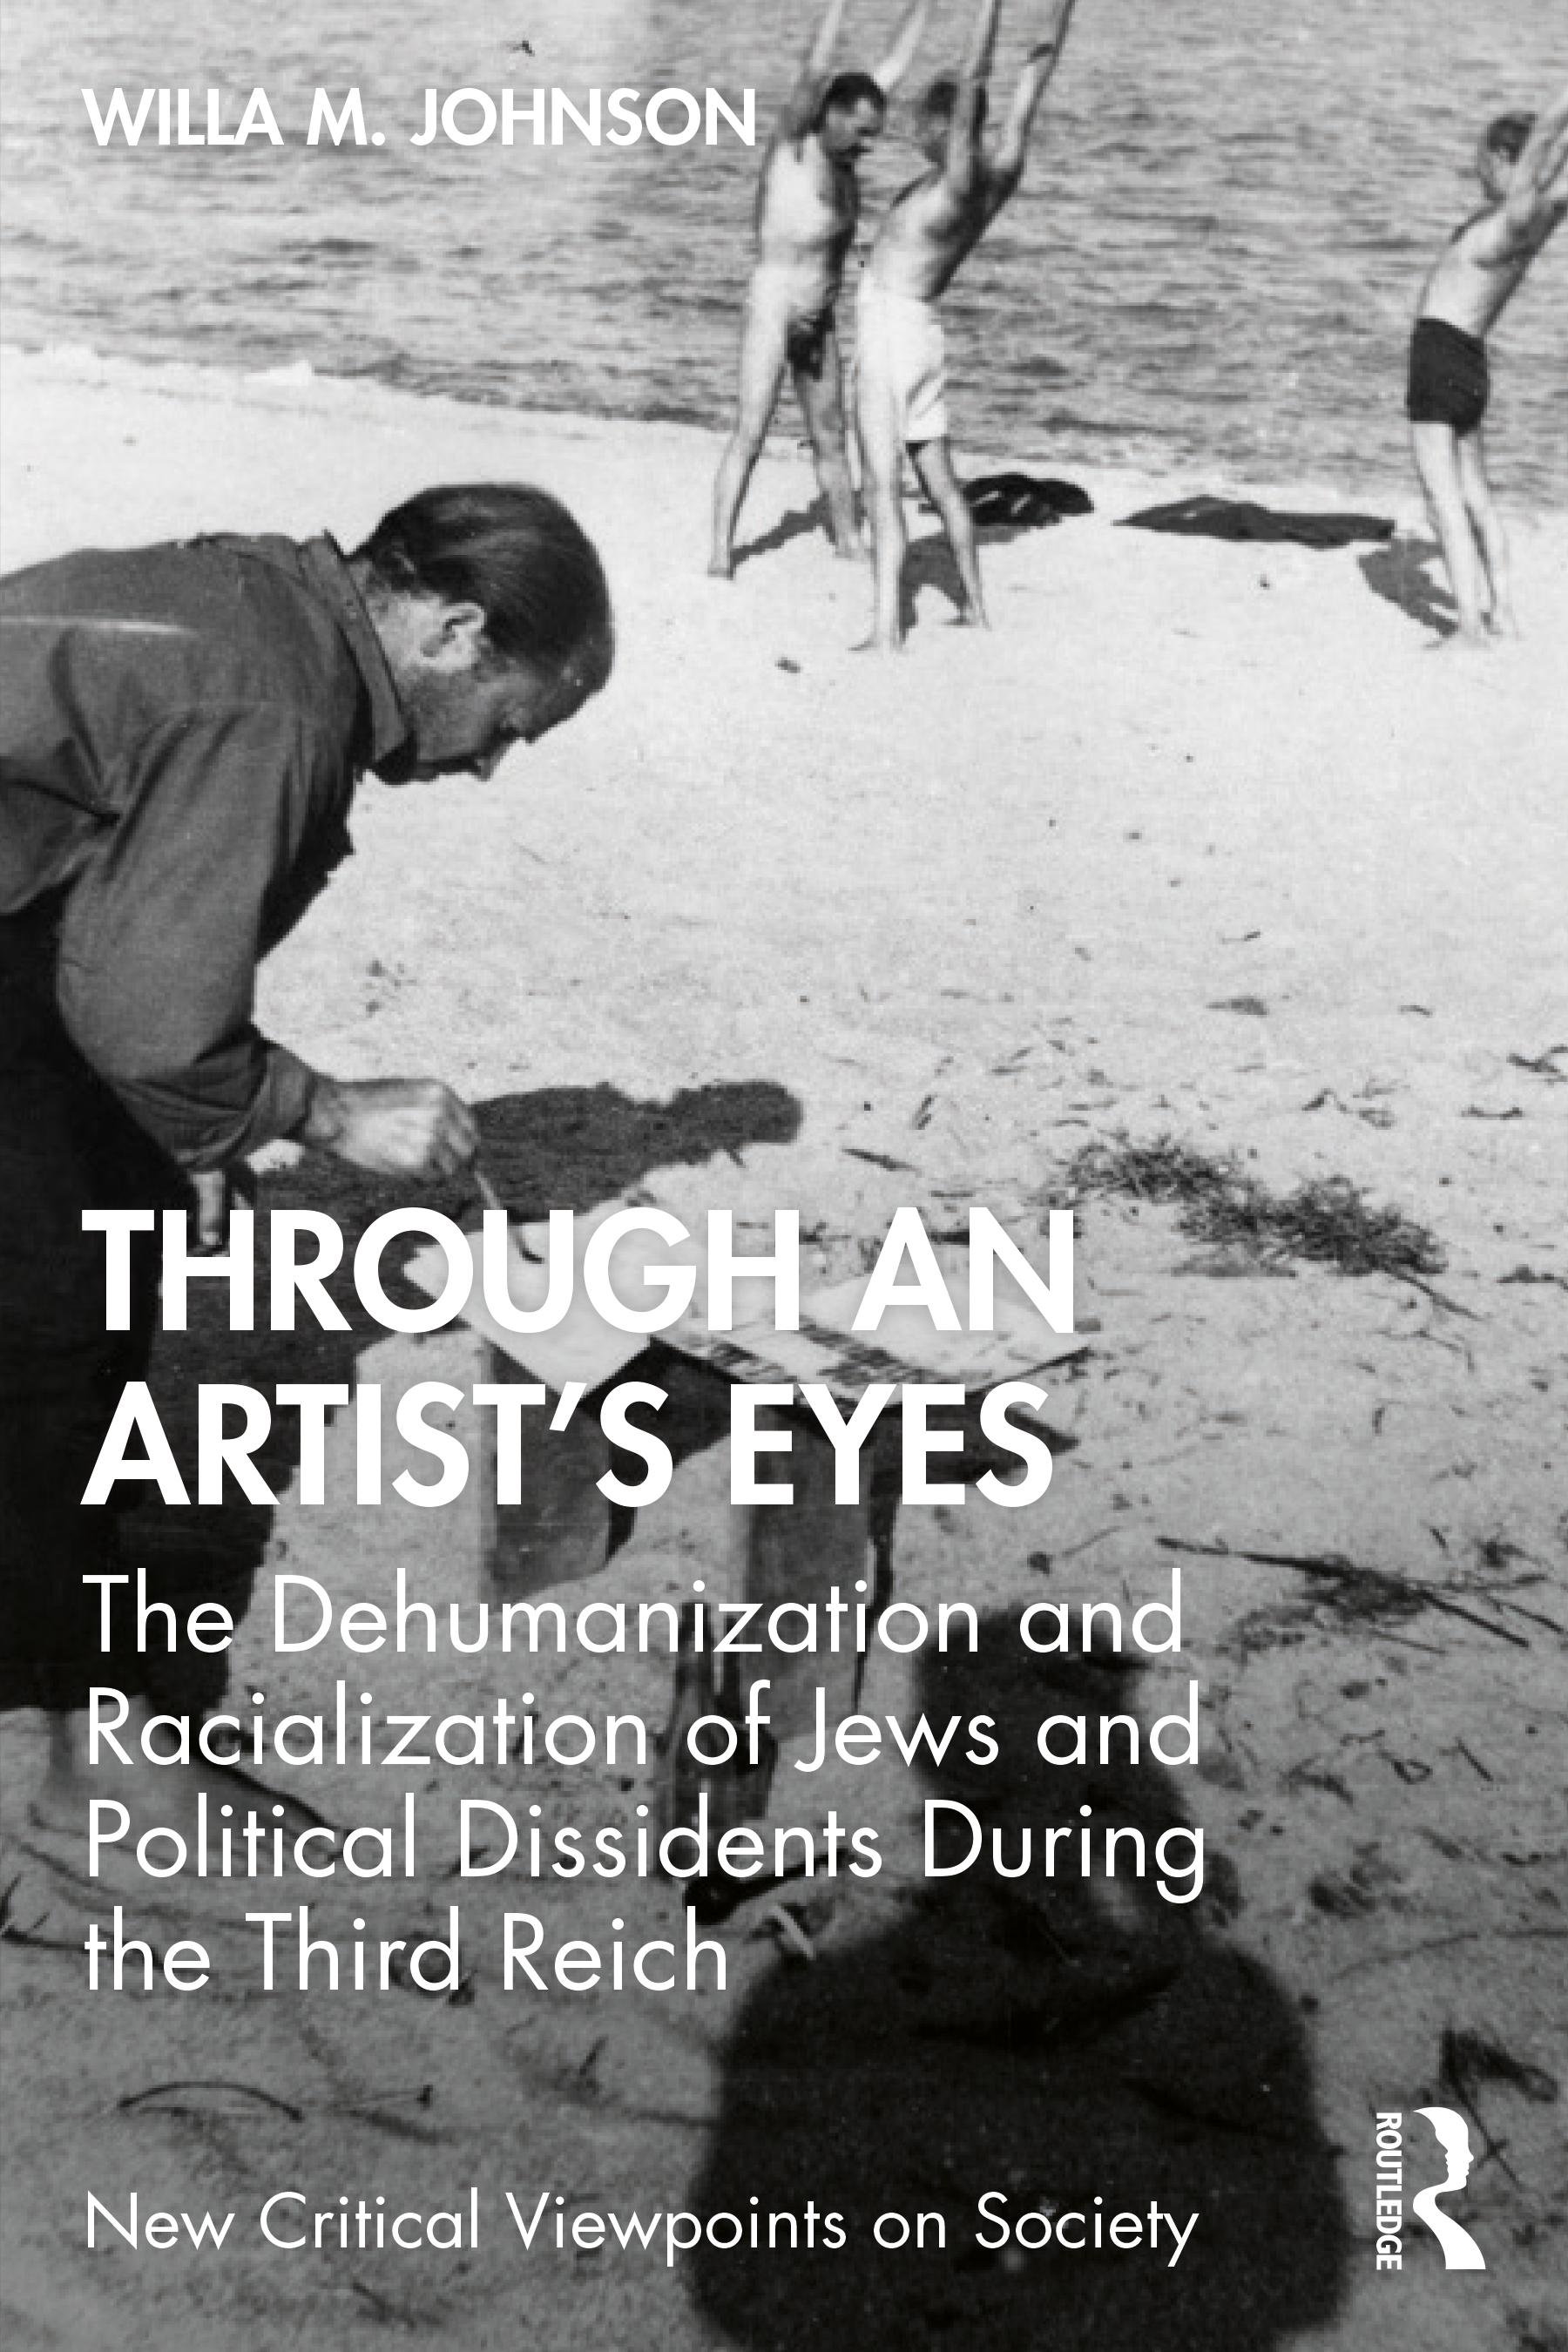 Through an Artist's Eyes